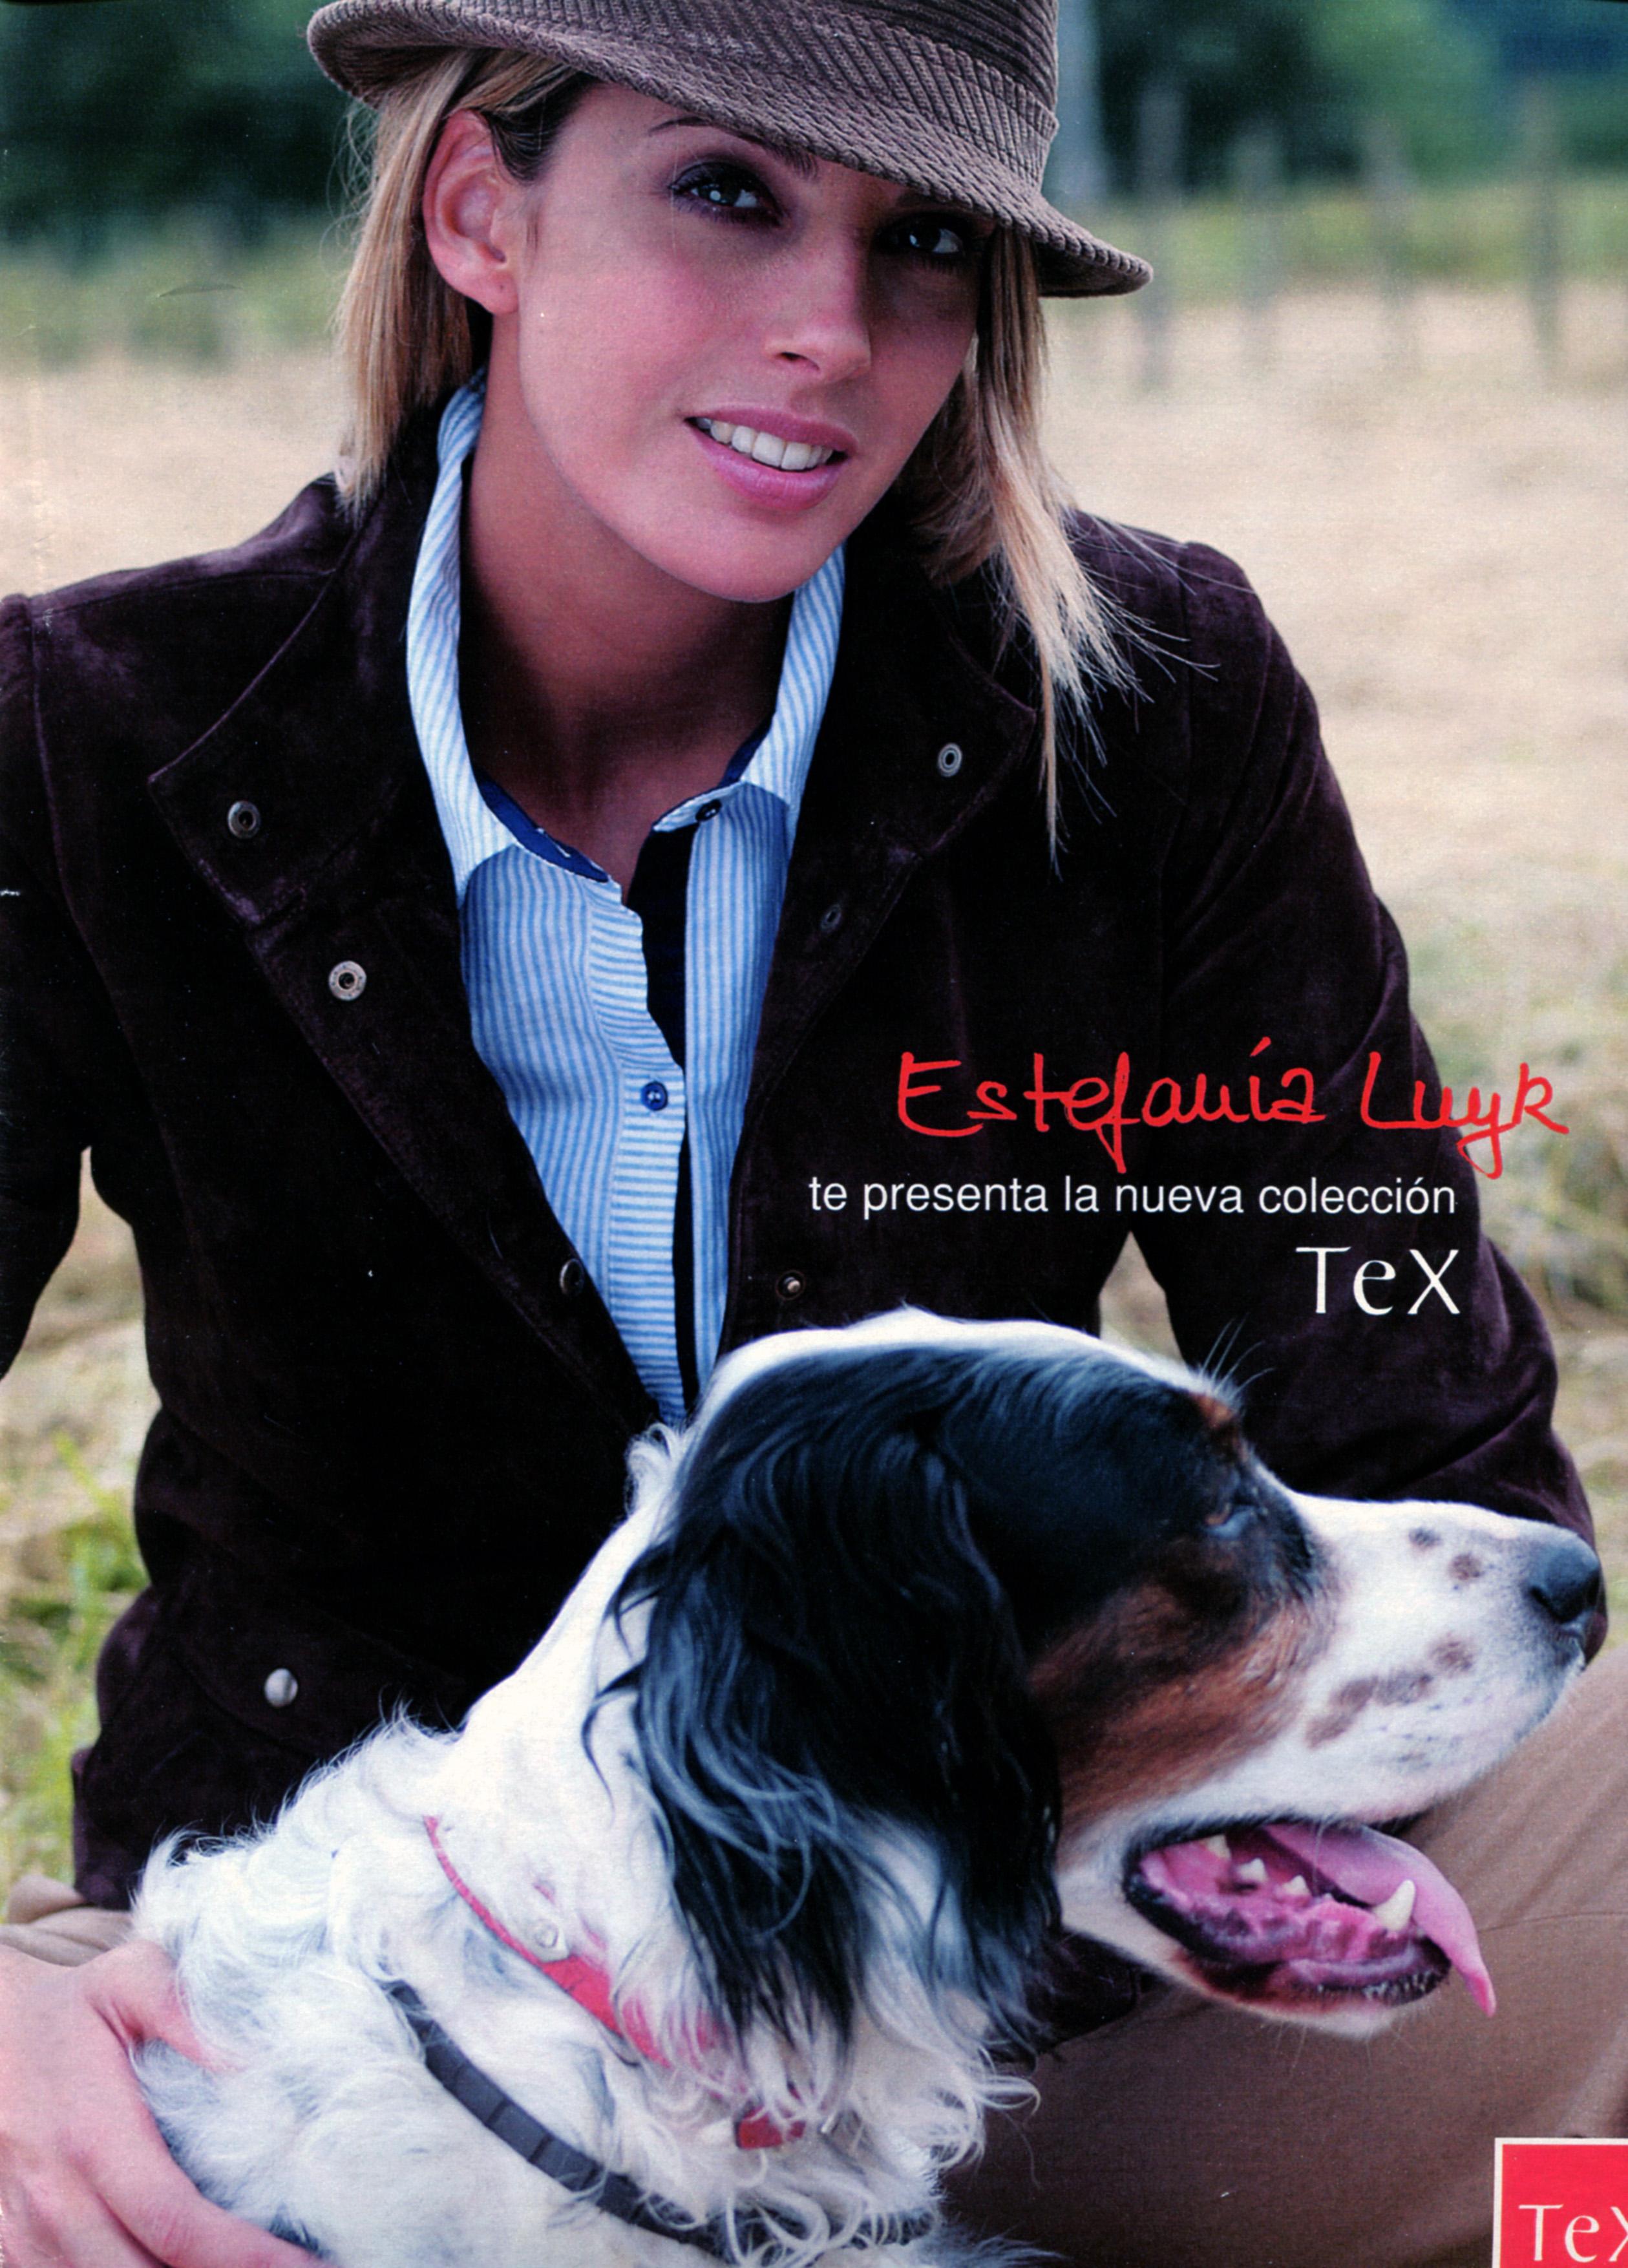 Estefania Luyk